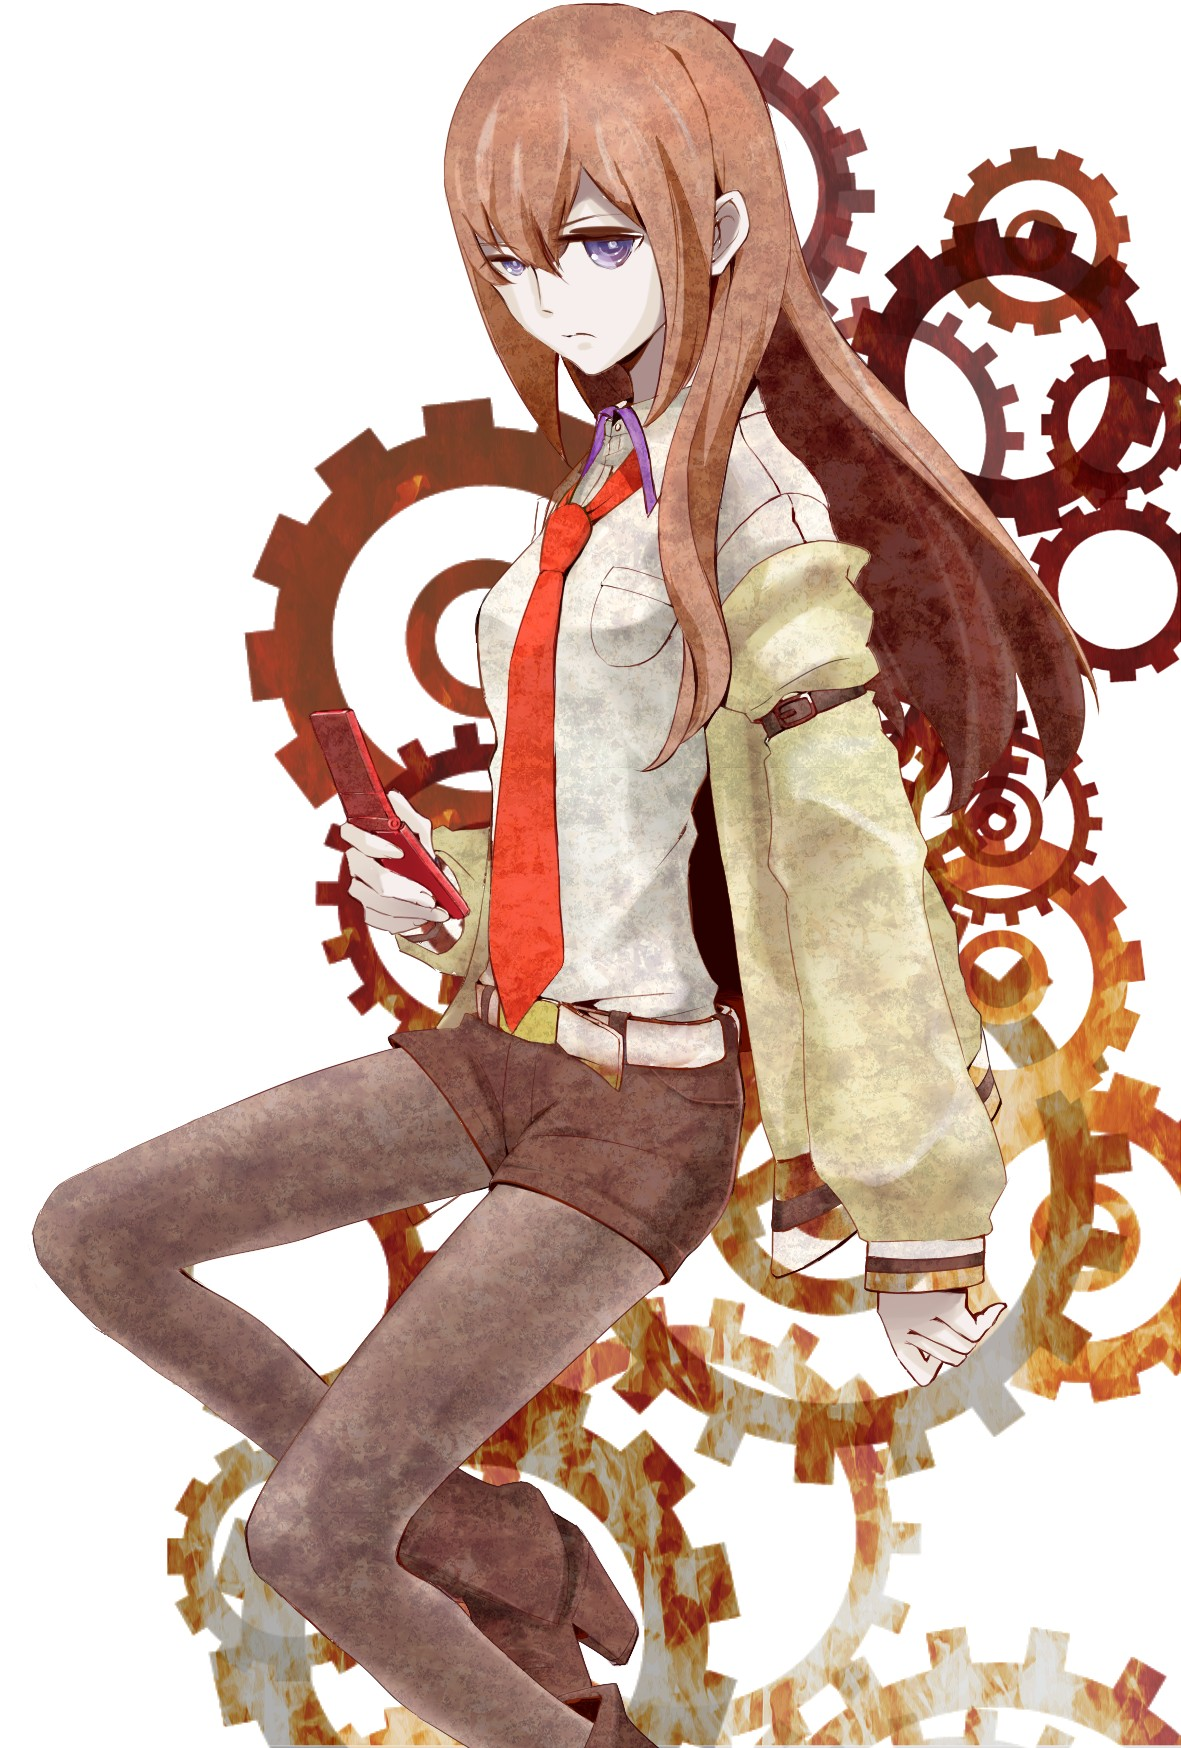 Makise Kurisu - Steins;Gate - Mobile Wallpaper #950413 ...